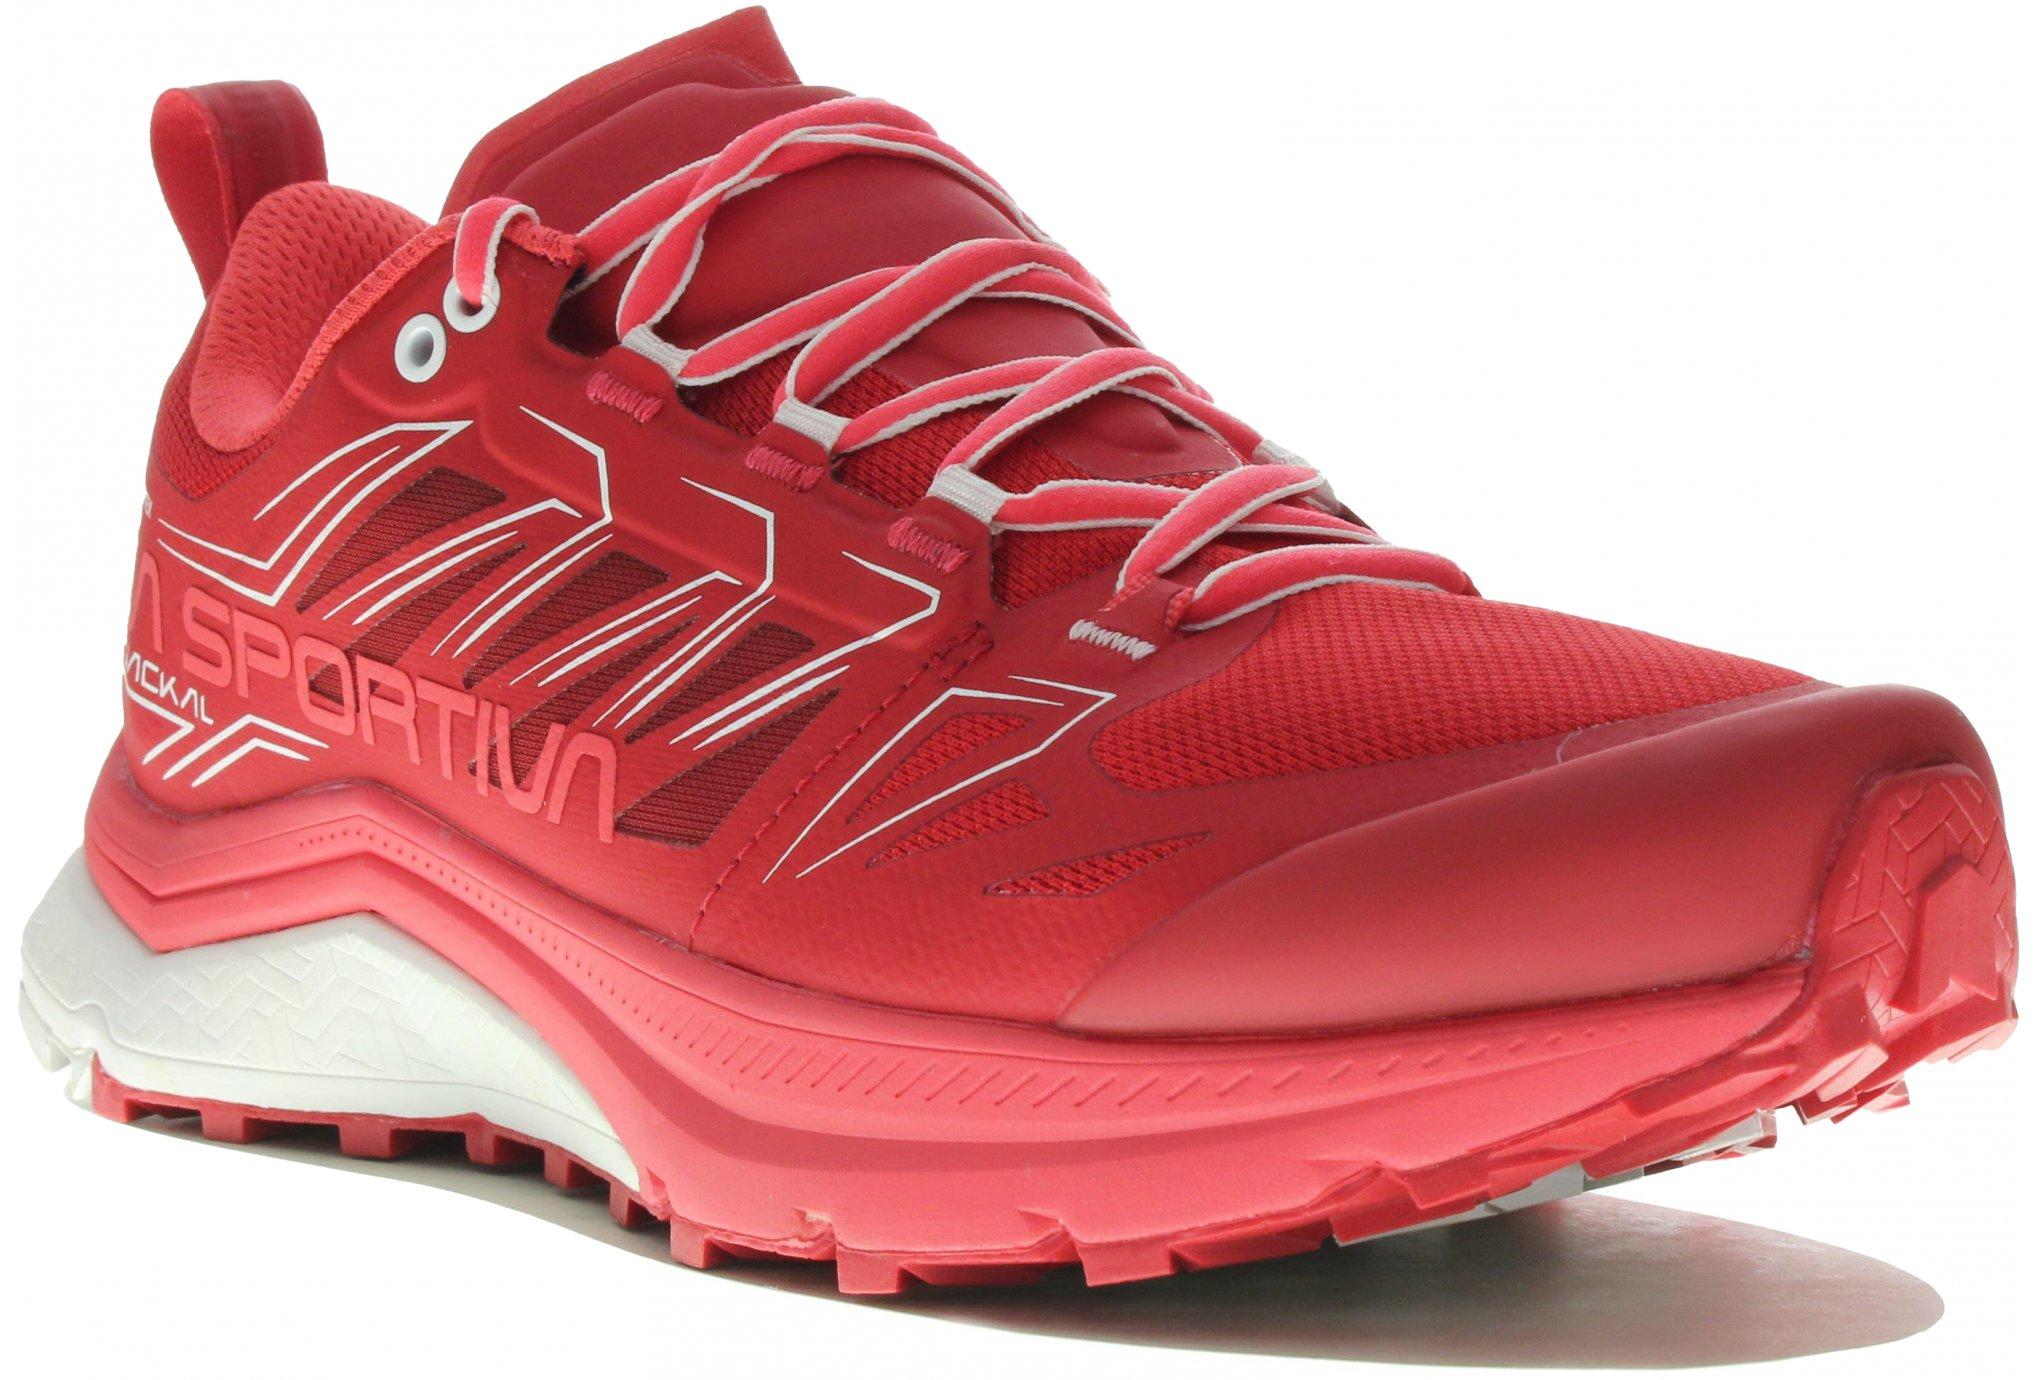 La Sportiva Jackal Gore-Tex W Chaussures running femme